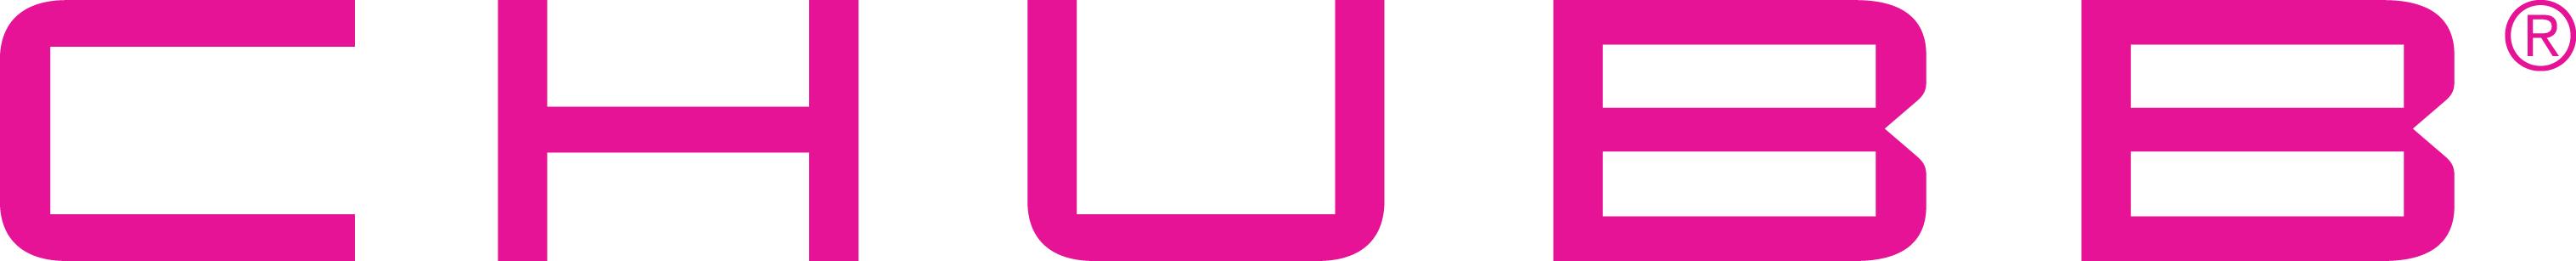 CHUBB_Logo_Magenta_RG1